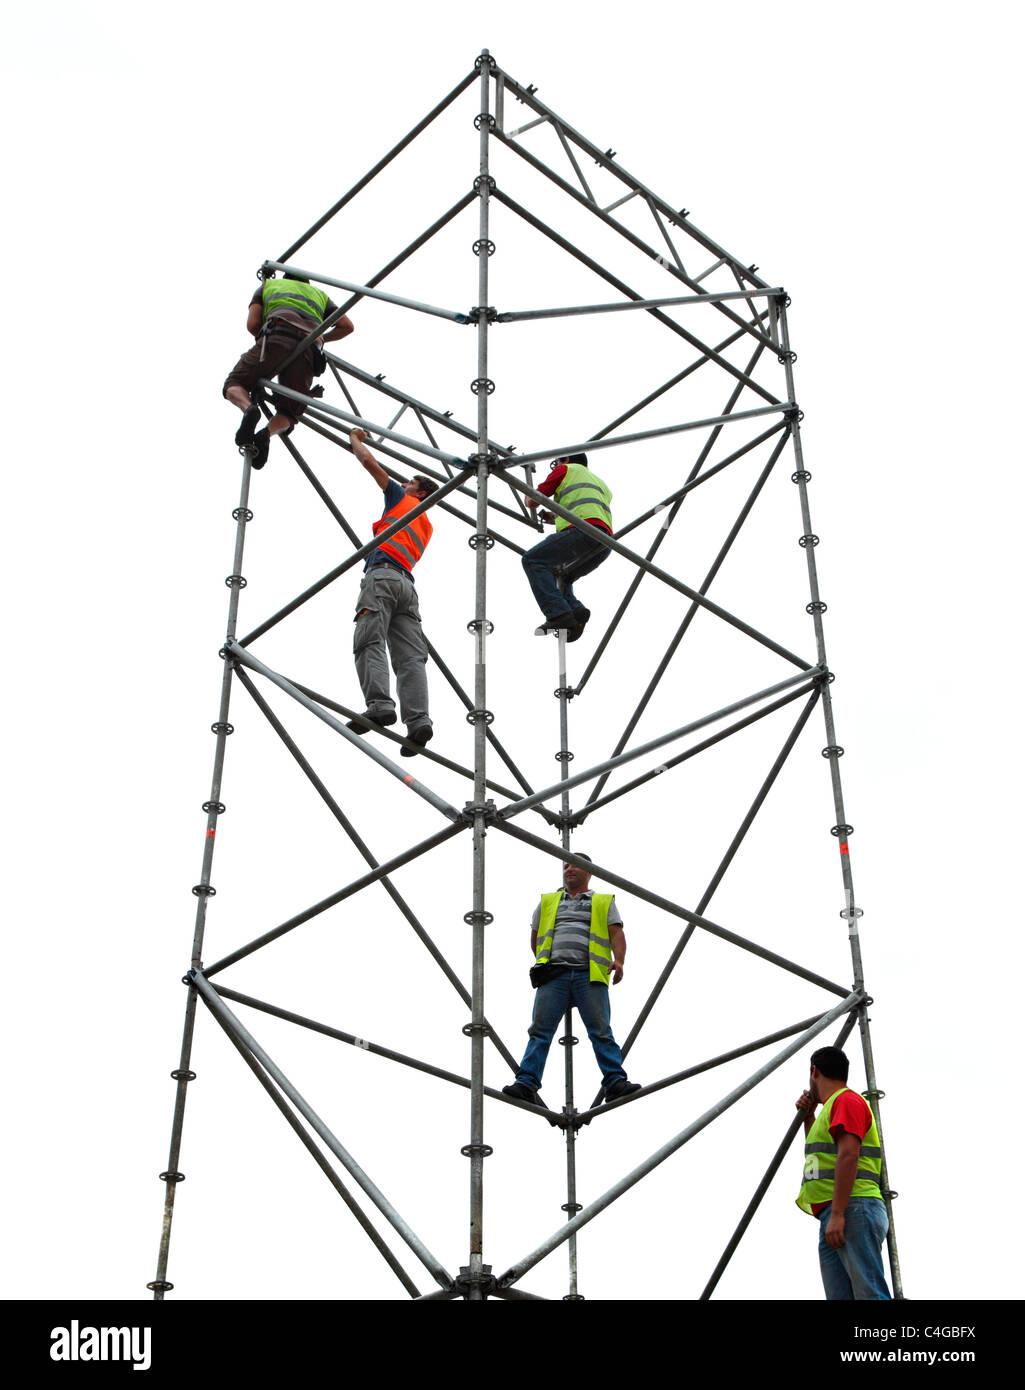 Team of men erecting tower scaffolding. - Stock Image